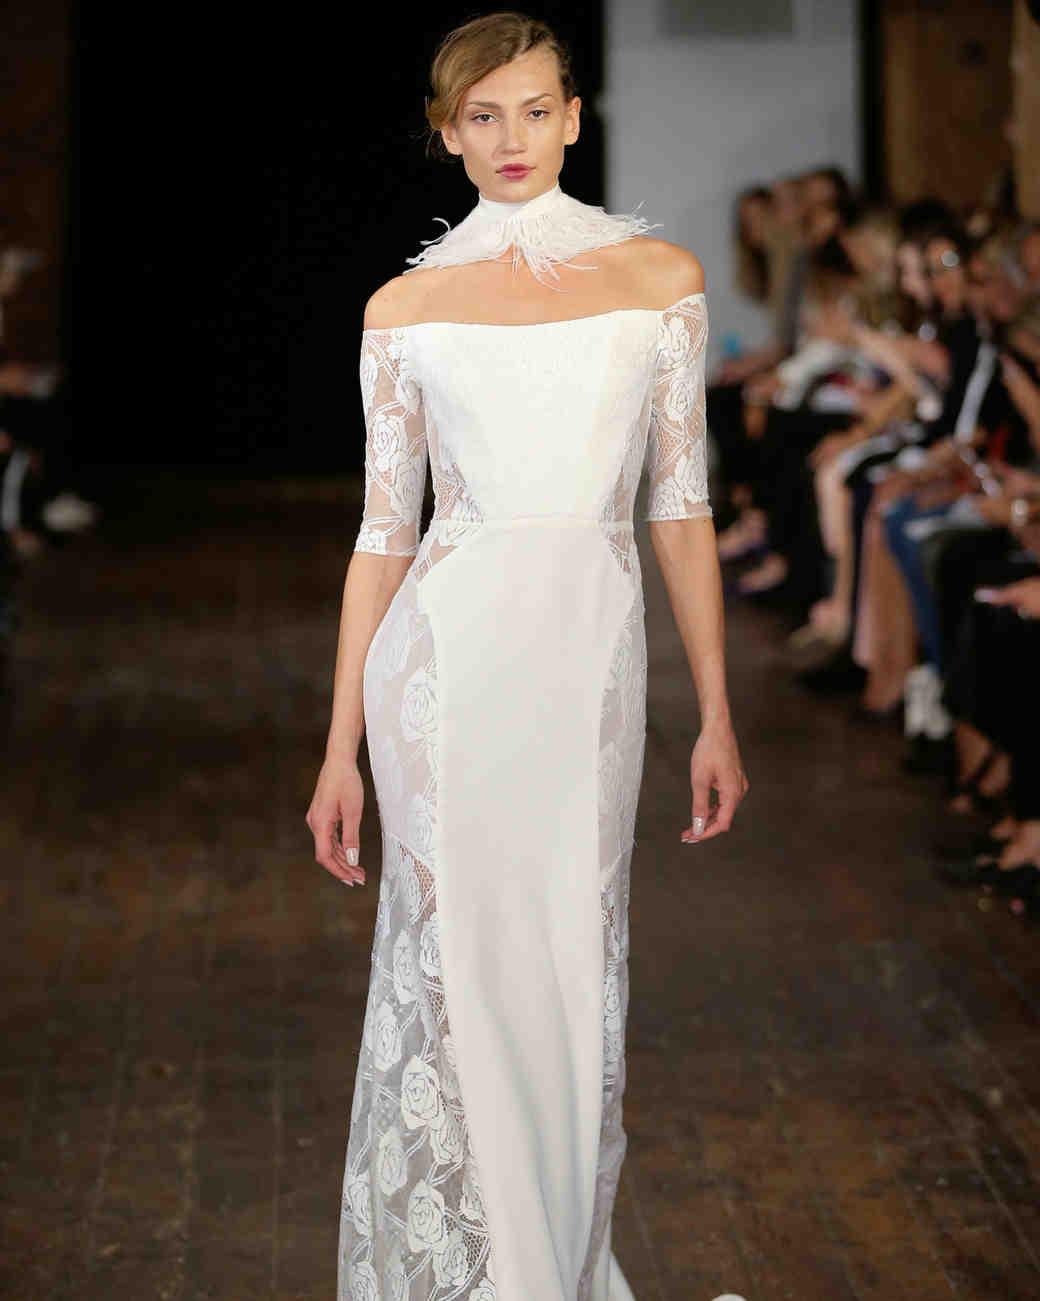 Audrey Hepburn Inspired Wedding Dresses 81 Cute Rivini by Rita Vinieris